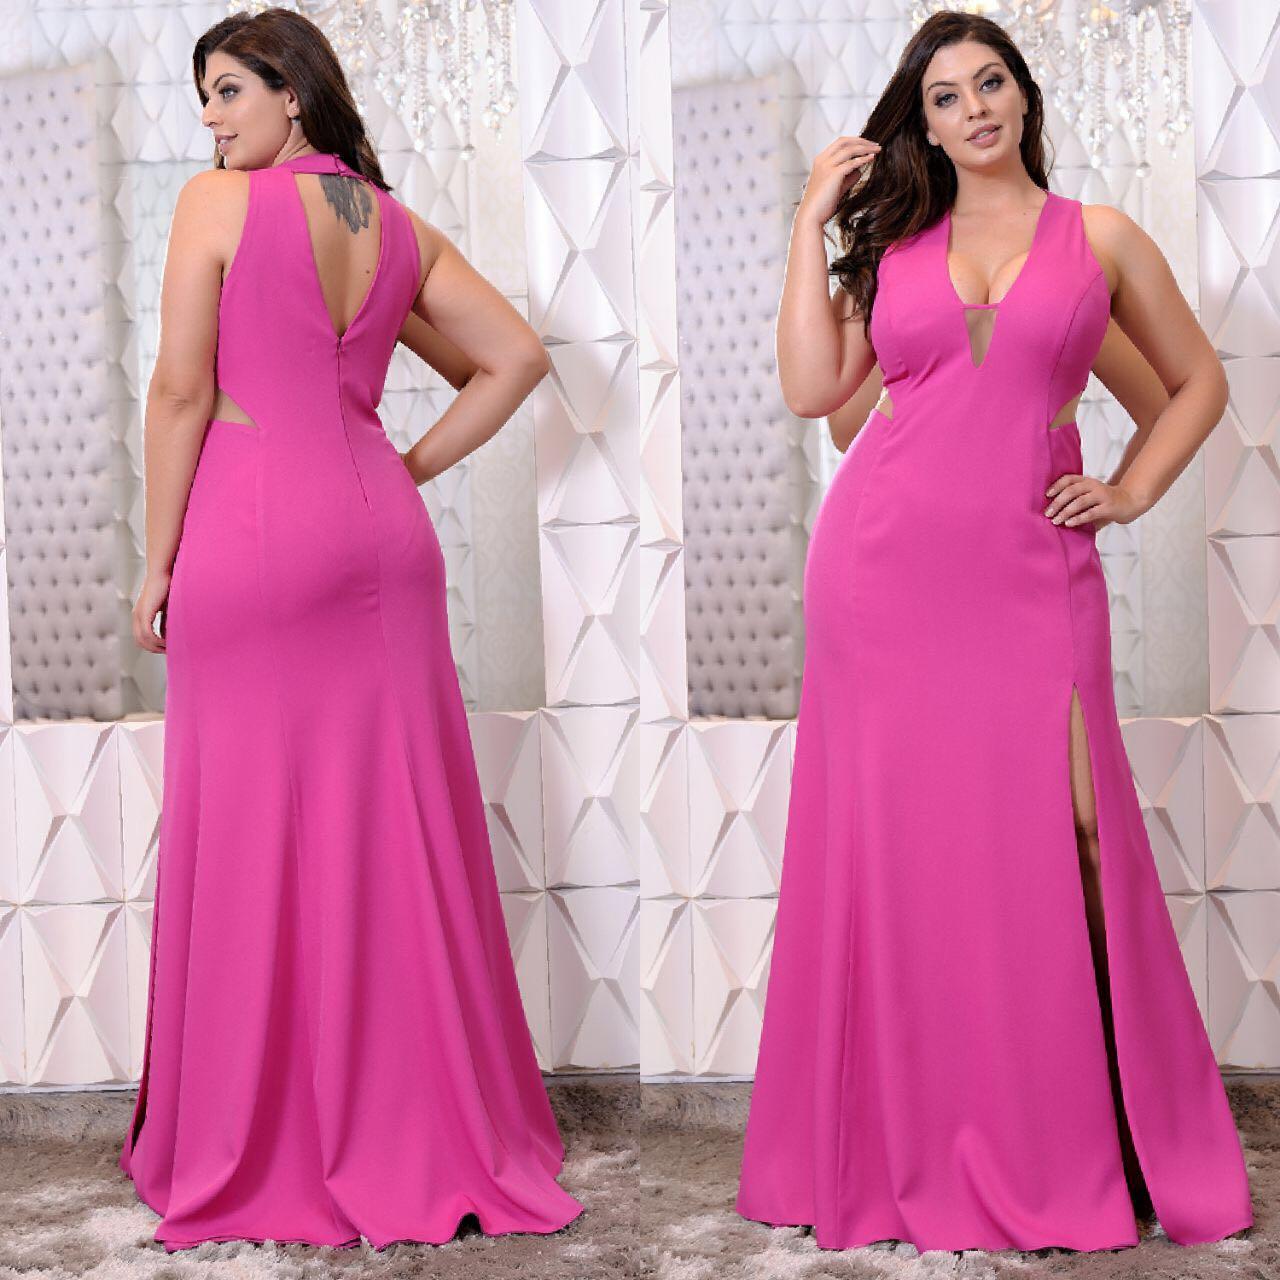 0a57a762d Vestido de festa pink minimalista Aluguel de Vestidos de Festa Longos no RJ,  Aluguel de Vestidos de Festa Plus Size no RJ